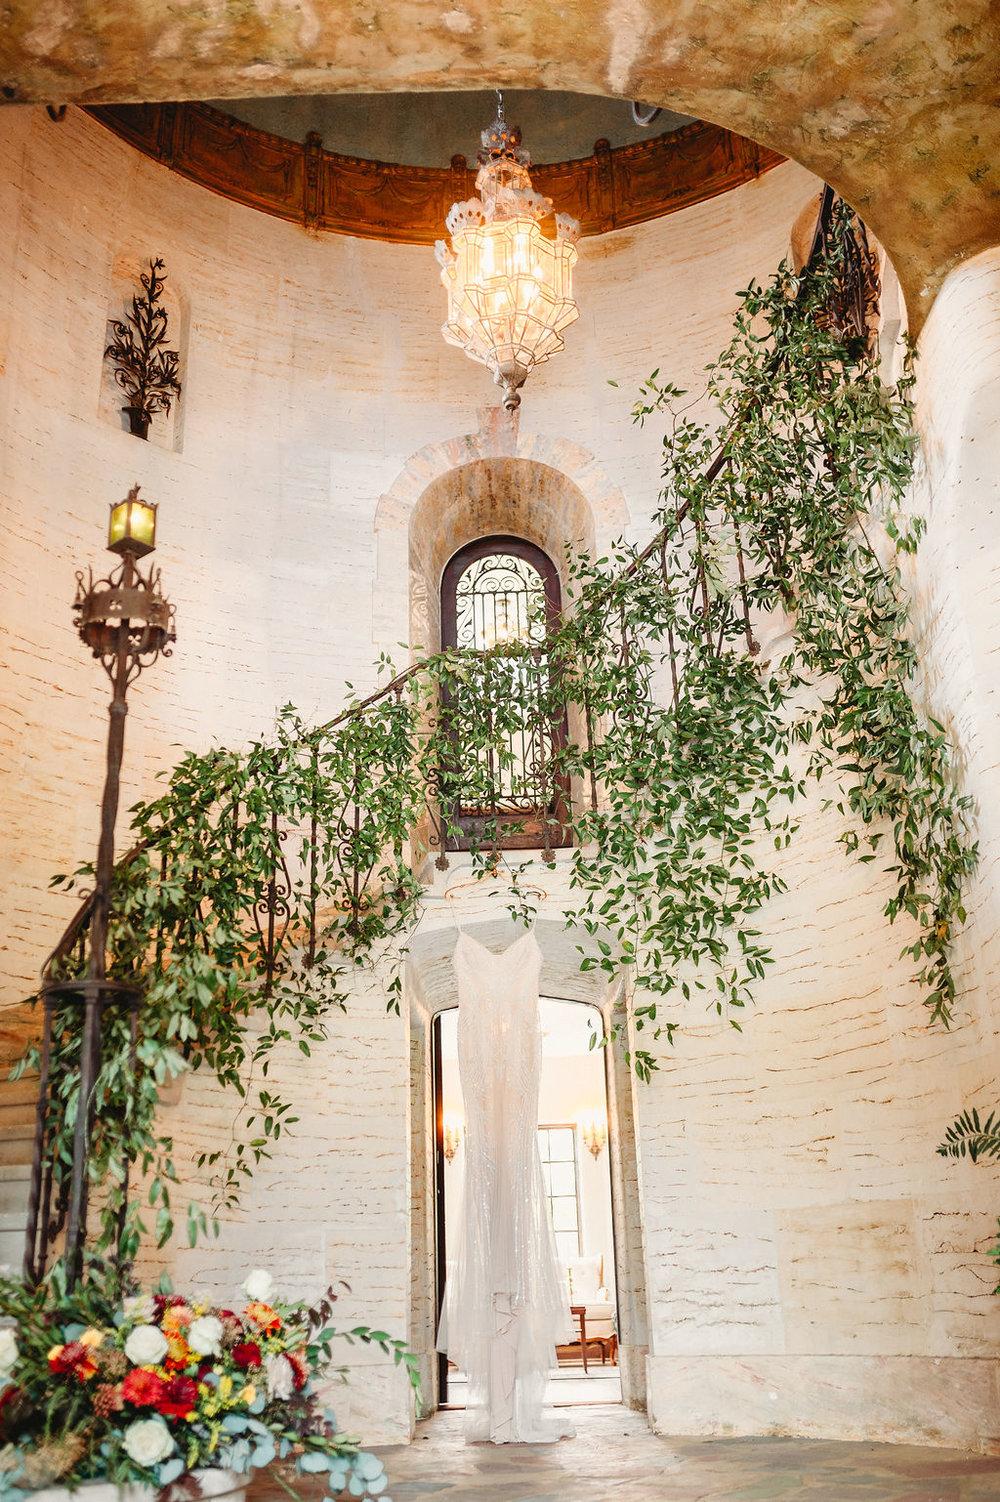 Dewitt-for-Love-Photography-Howey-Mansion-Photos-Wedding-Photographer-17.jpg